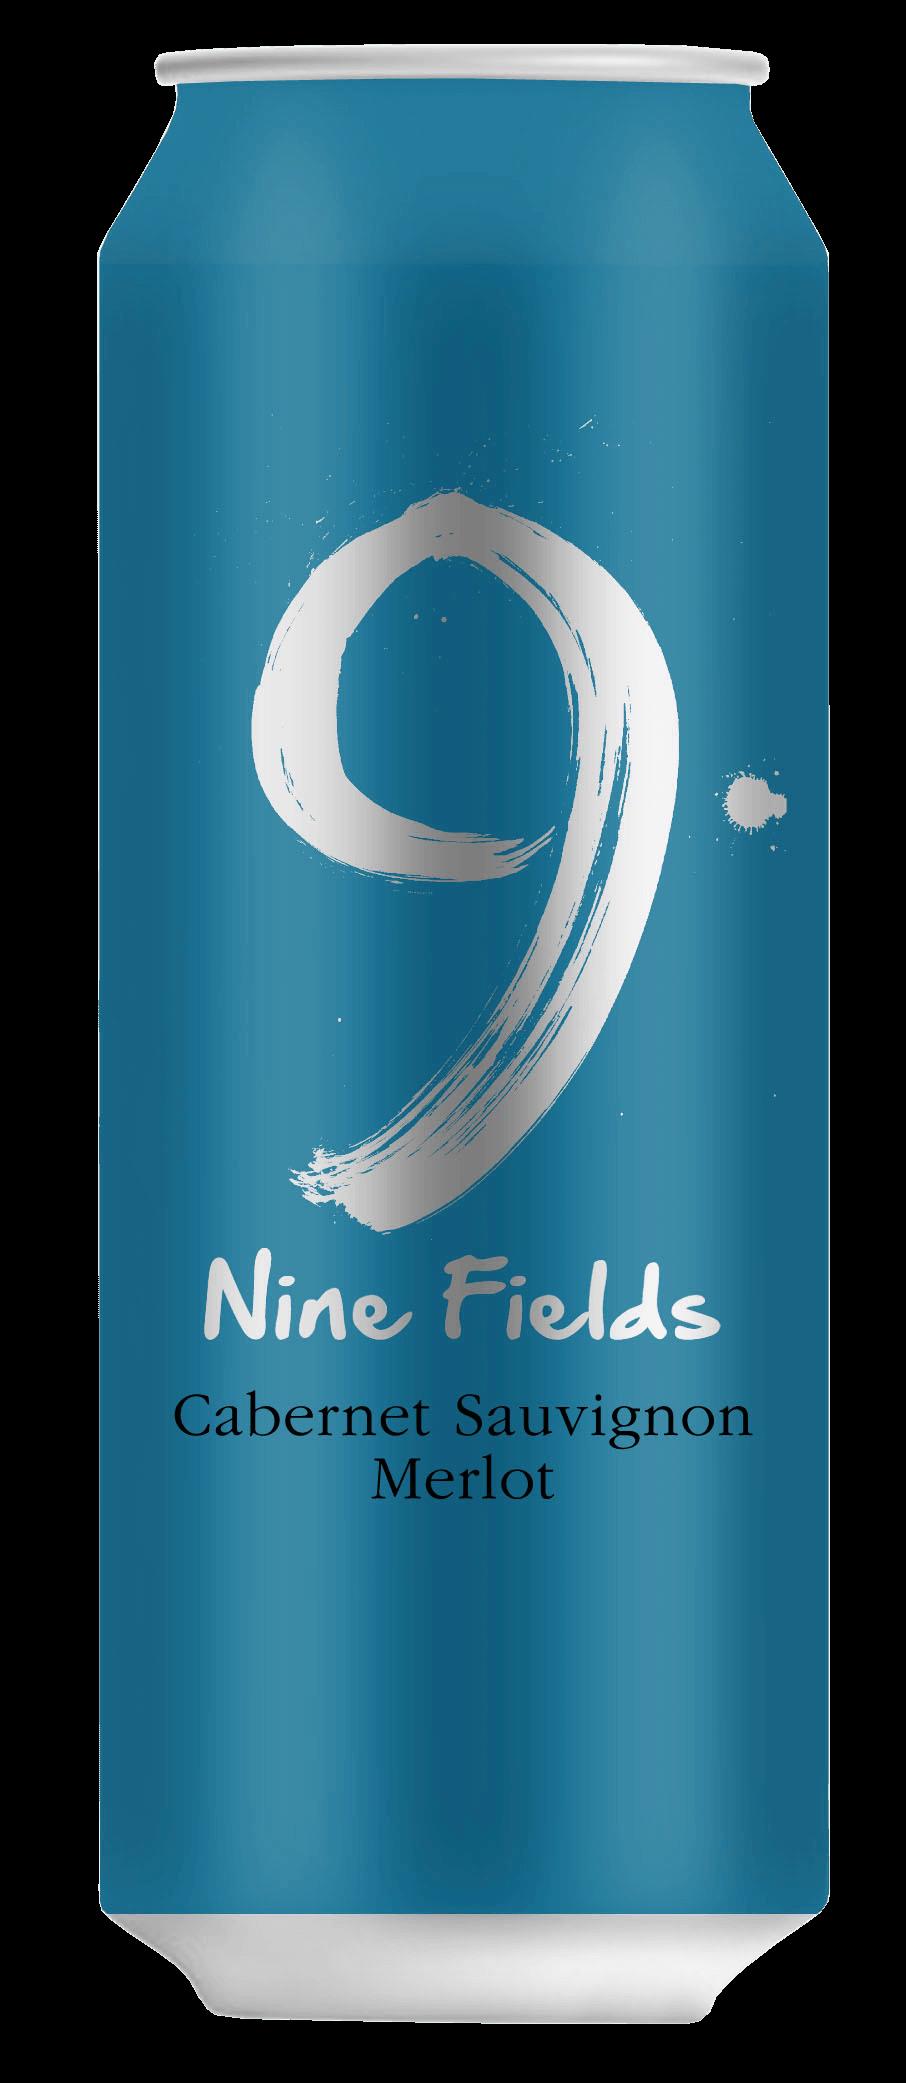 9 Fields - Cabernet Sauvignon Merlot Can